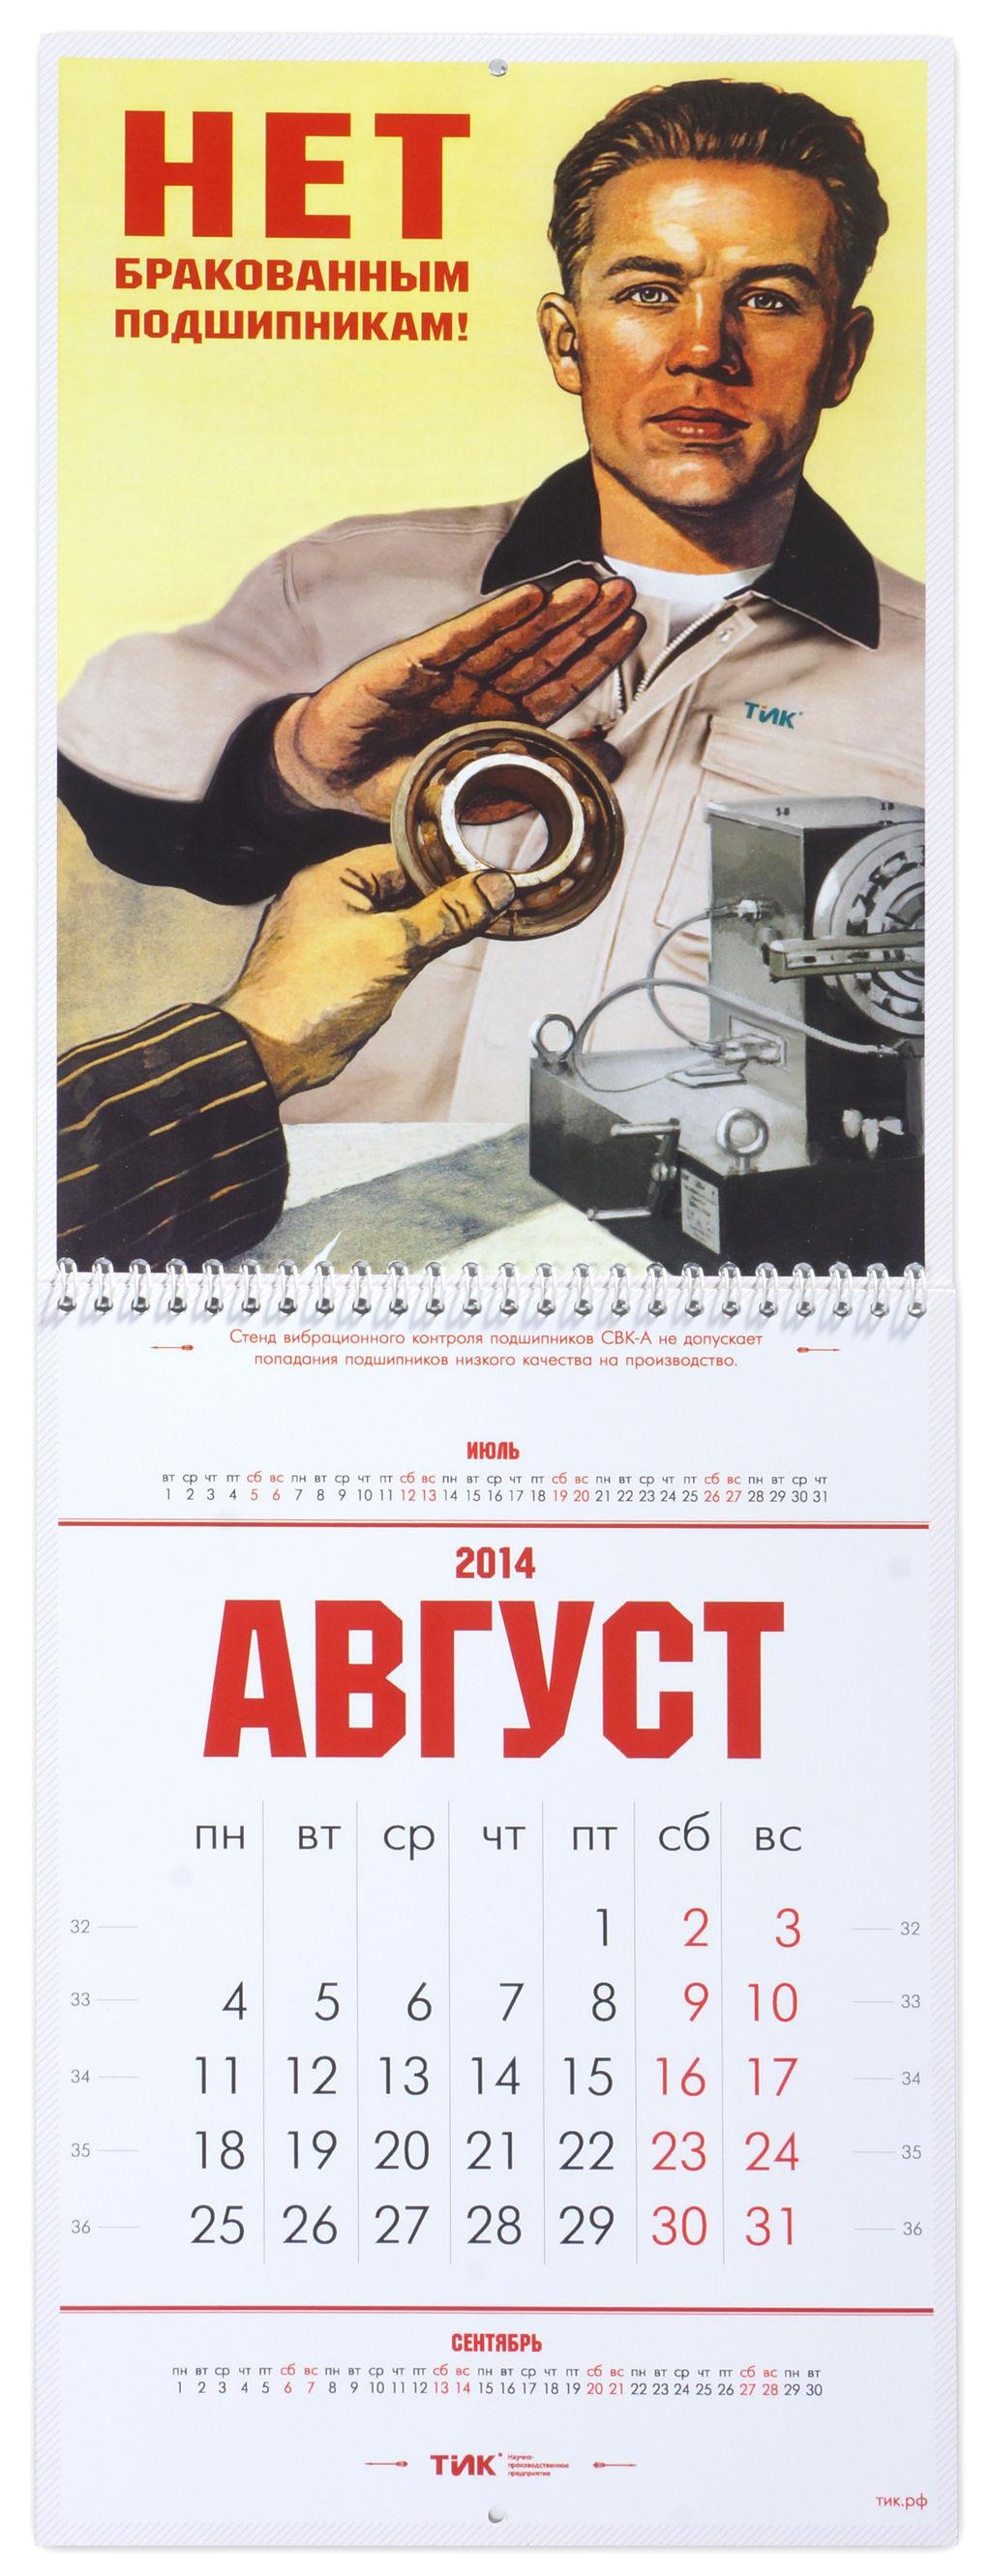 Календарь для НПП «Тик»